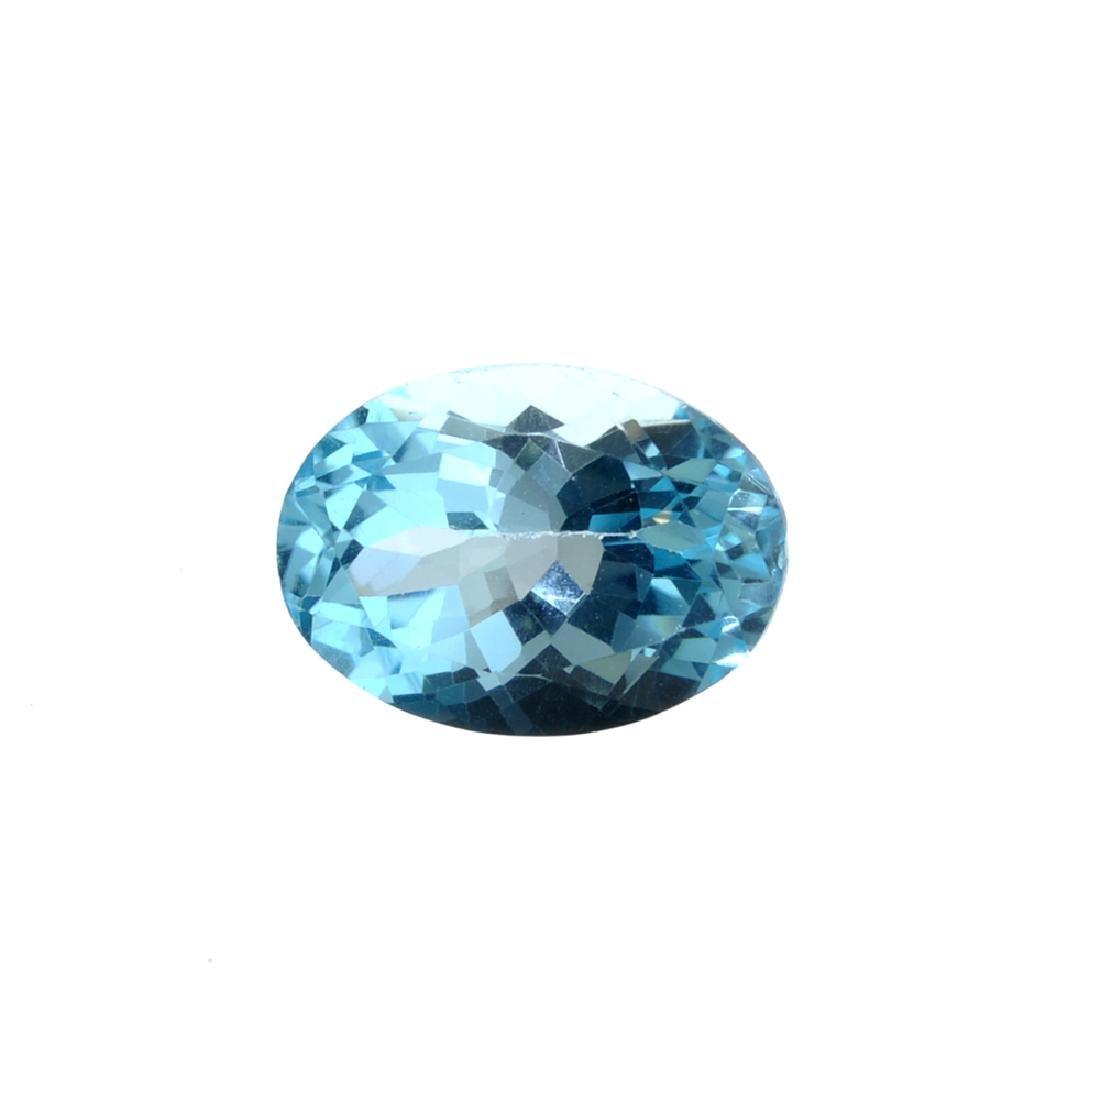 APP: 0.4k 14.78CT Oval Cut Blue Topaz Gemstone